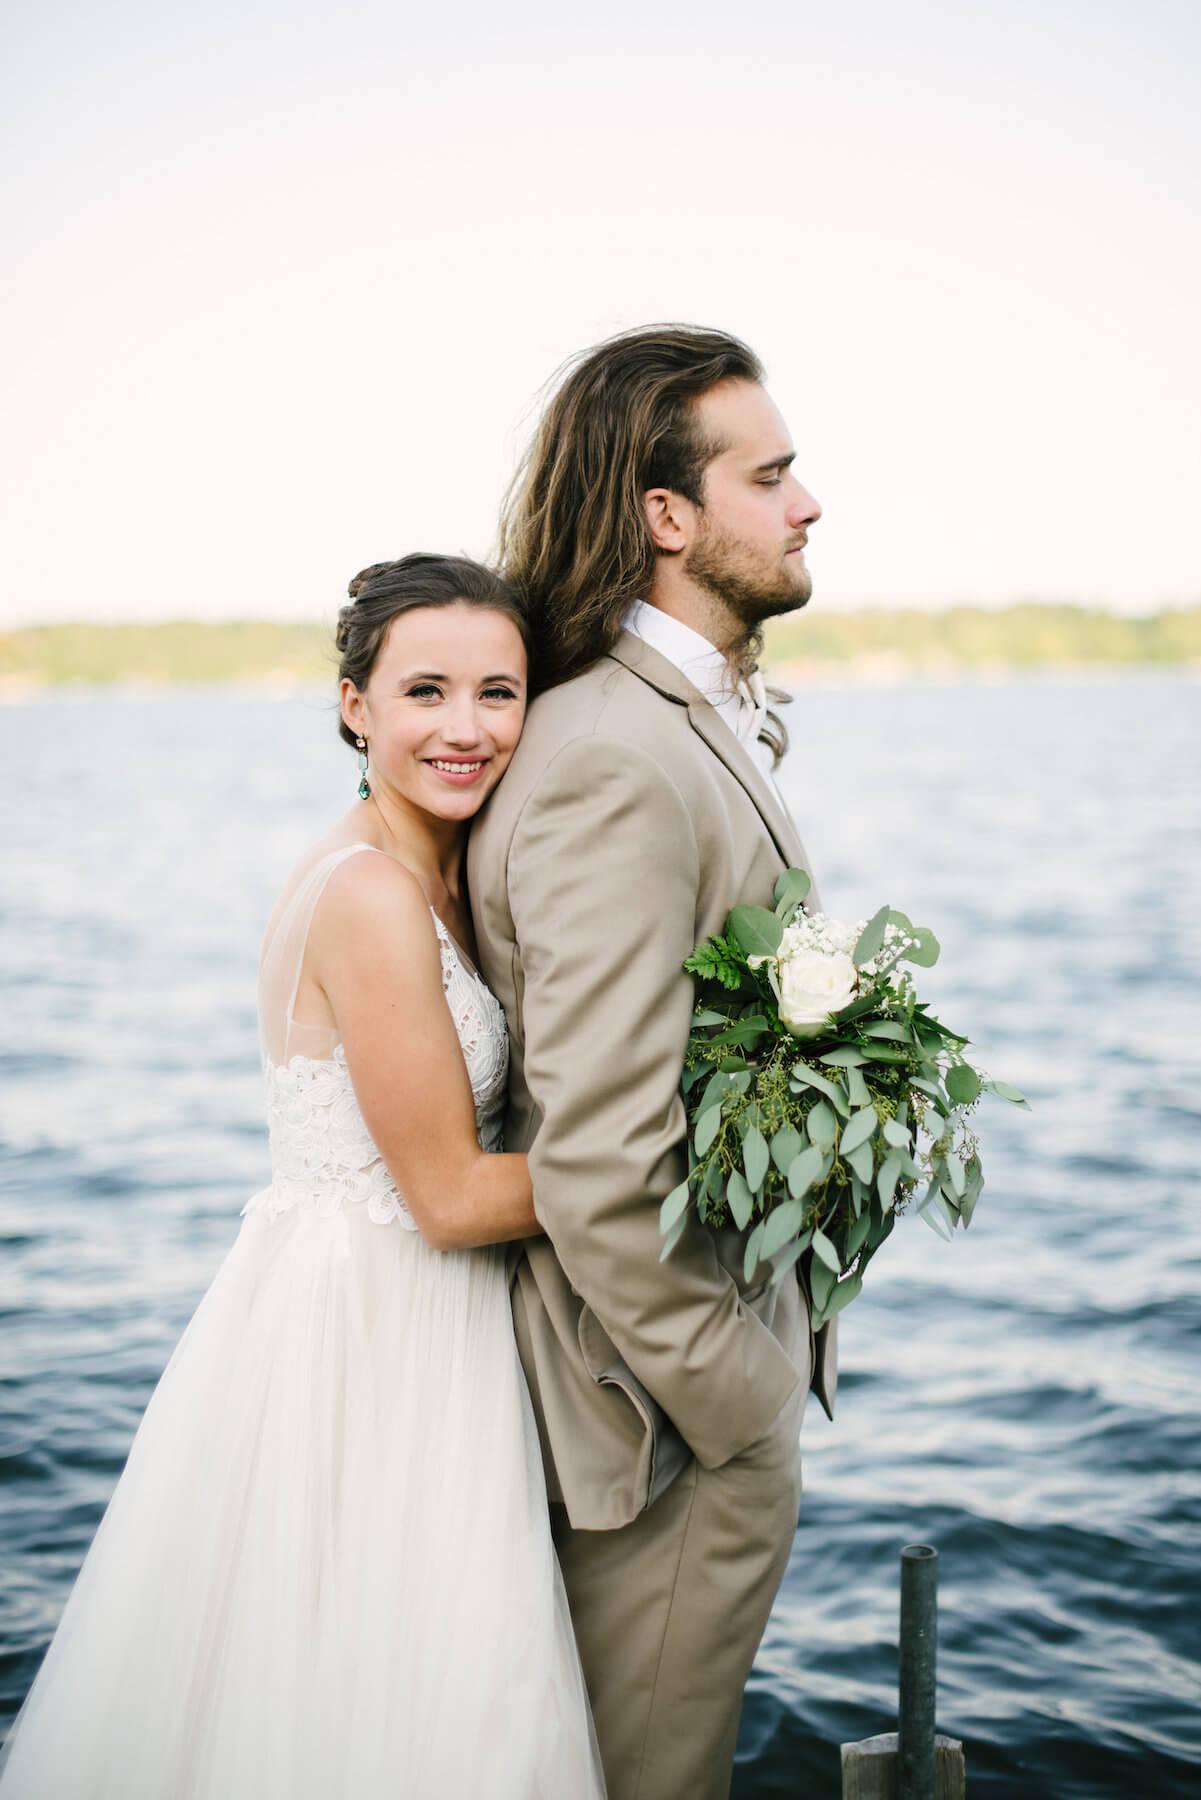 engle-olson-wedding-blair-taylor-36.jpg